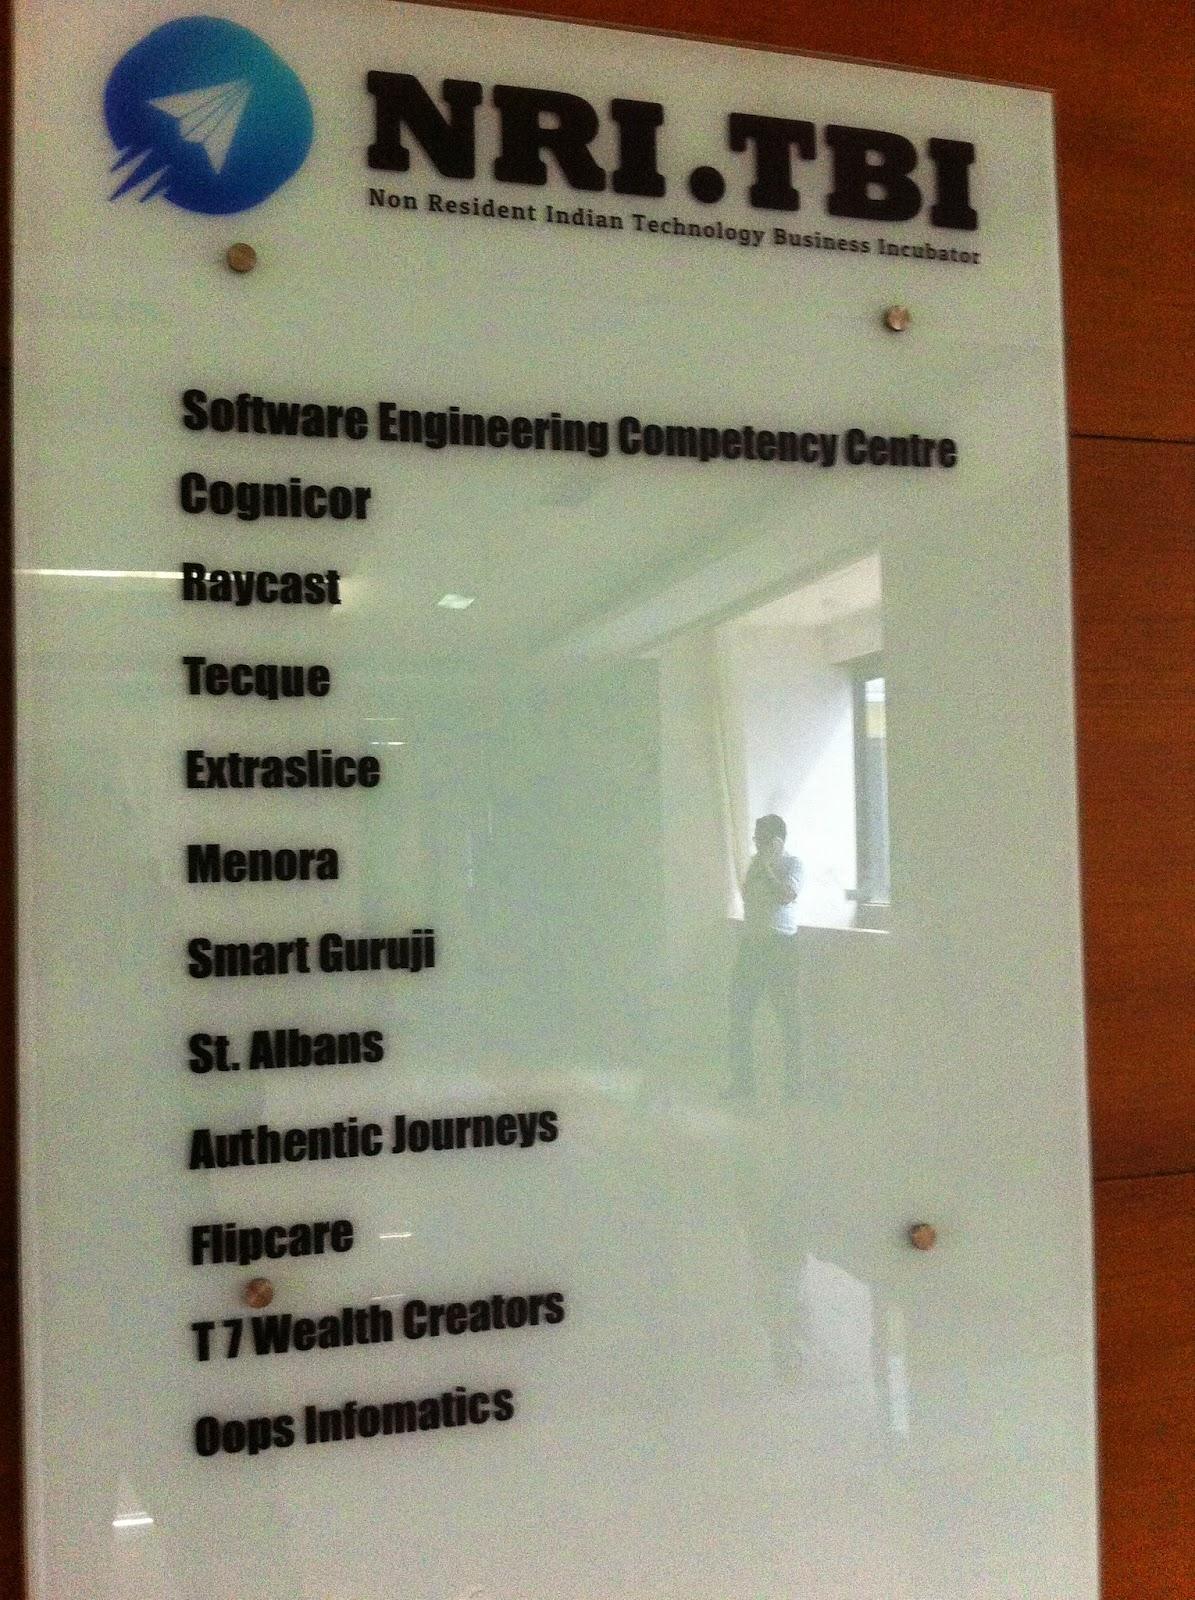 Signboard listing companies in NRITBI, Infopark, Kochi